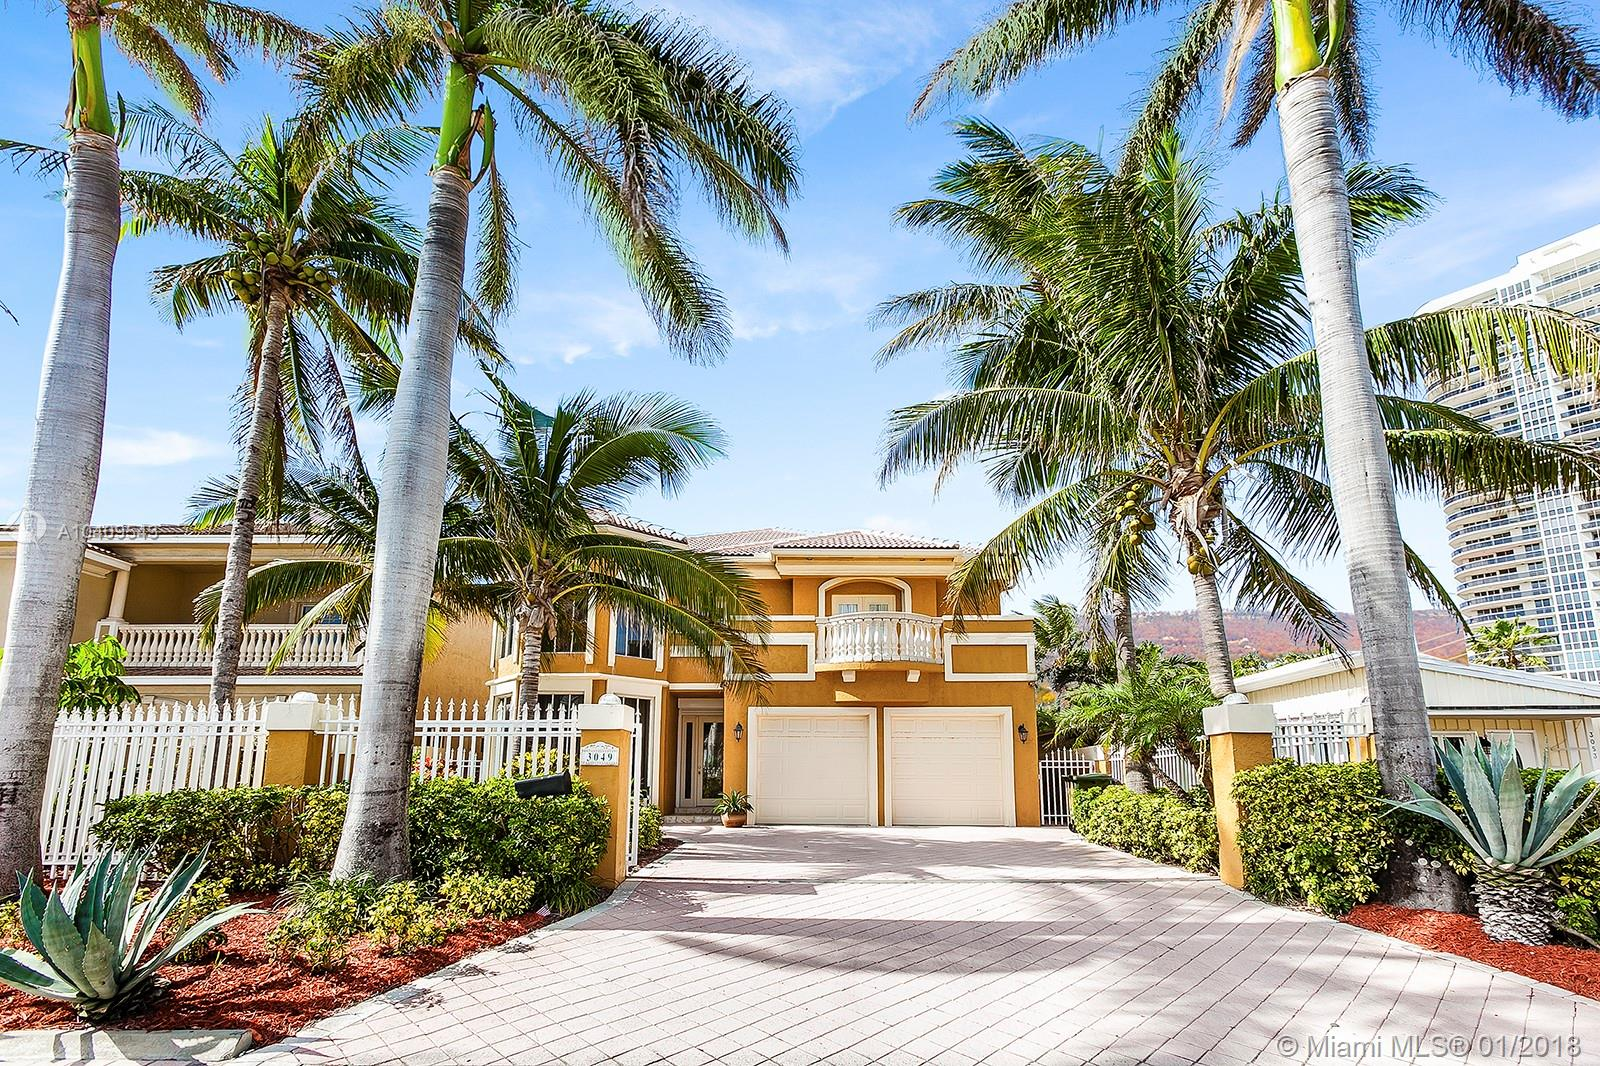 3049 N Atlantic Blvd, Sea Ranch Lakes, Florida